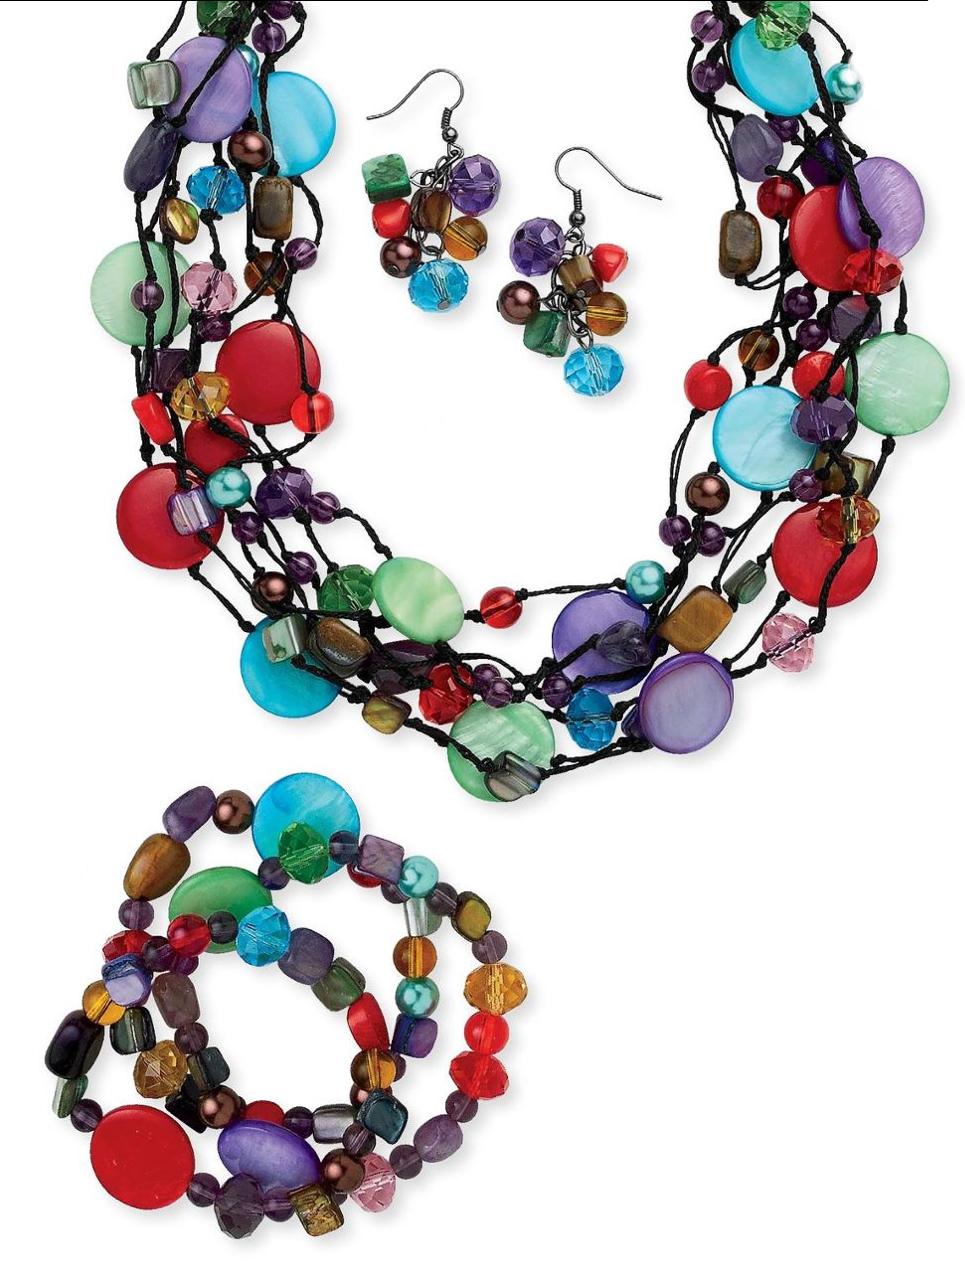 Premier designs jewelry 2015 - Spectrum By Premier Designs Jewelry